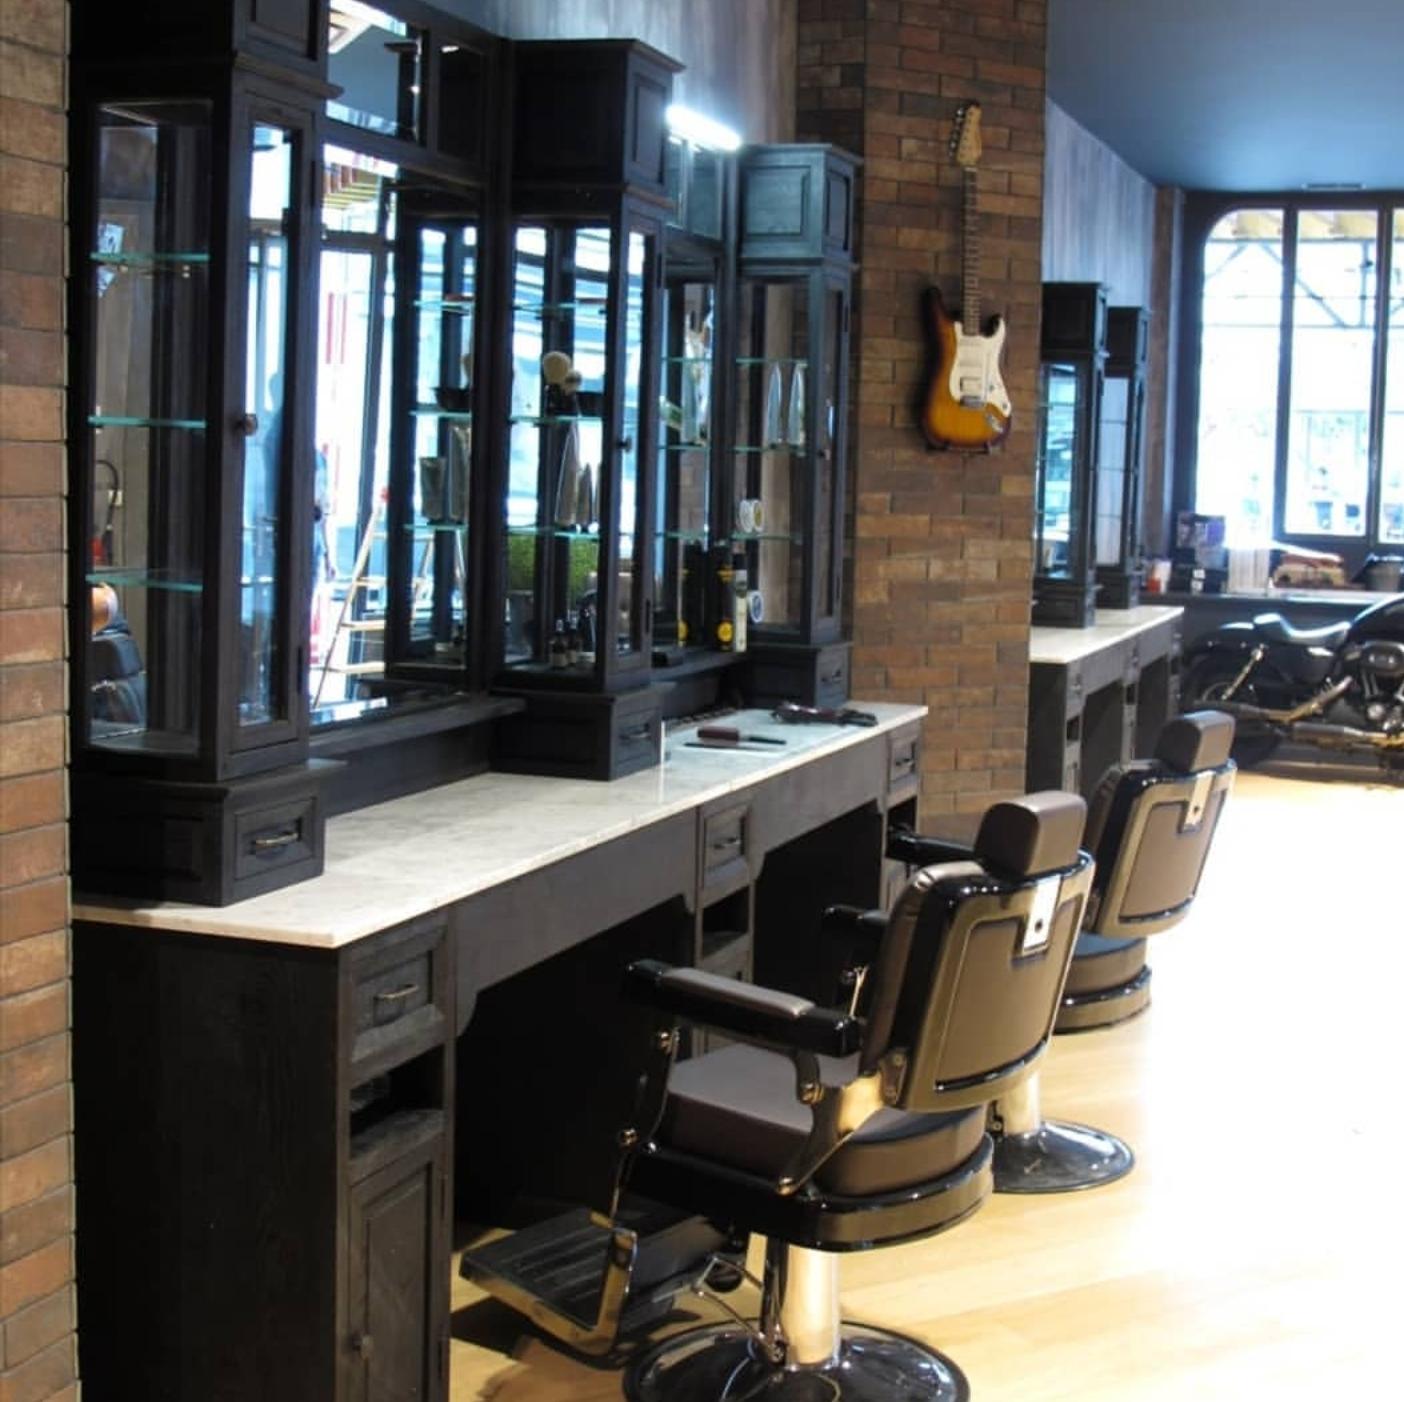 Classic black barber units   Black barber chair   Barbershop interior   Oldschool   Barberchairs heavy duty